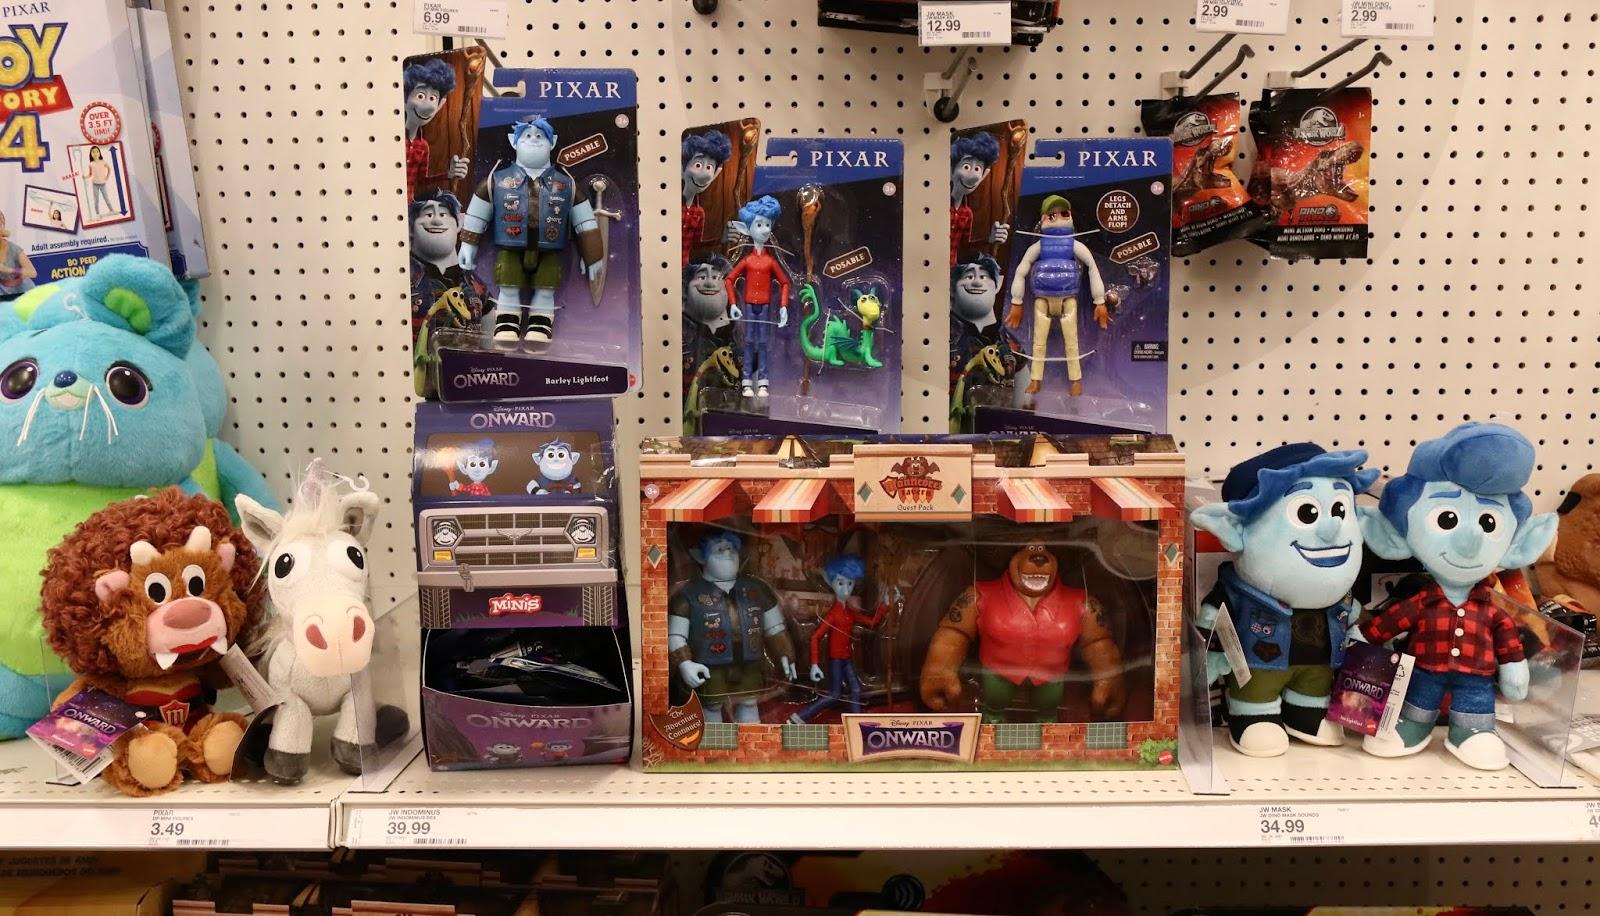 disney pixar onward toys mattel